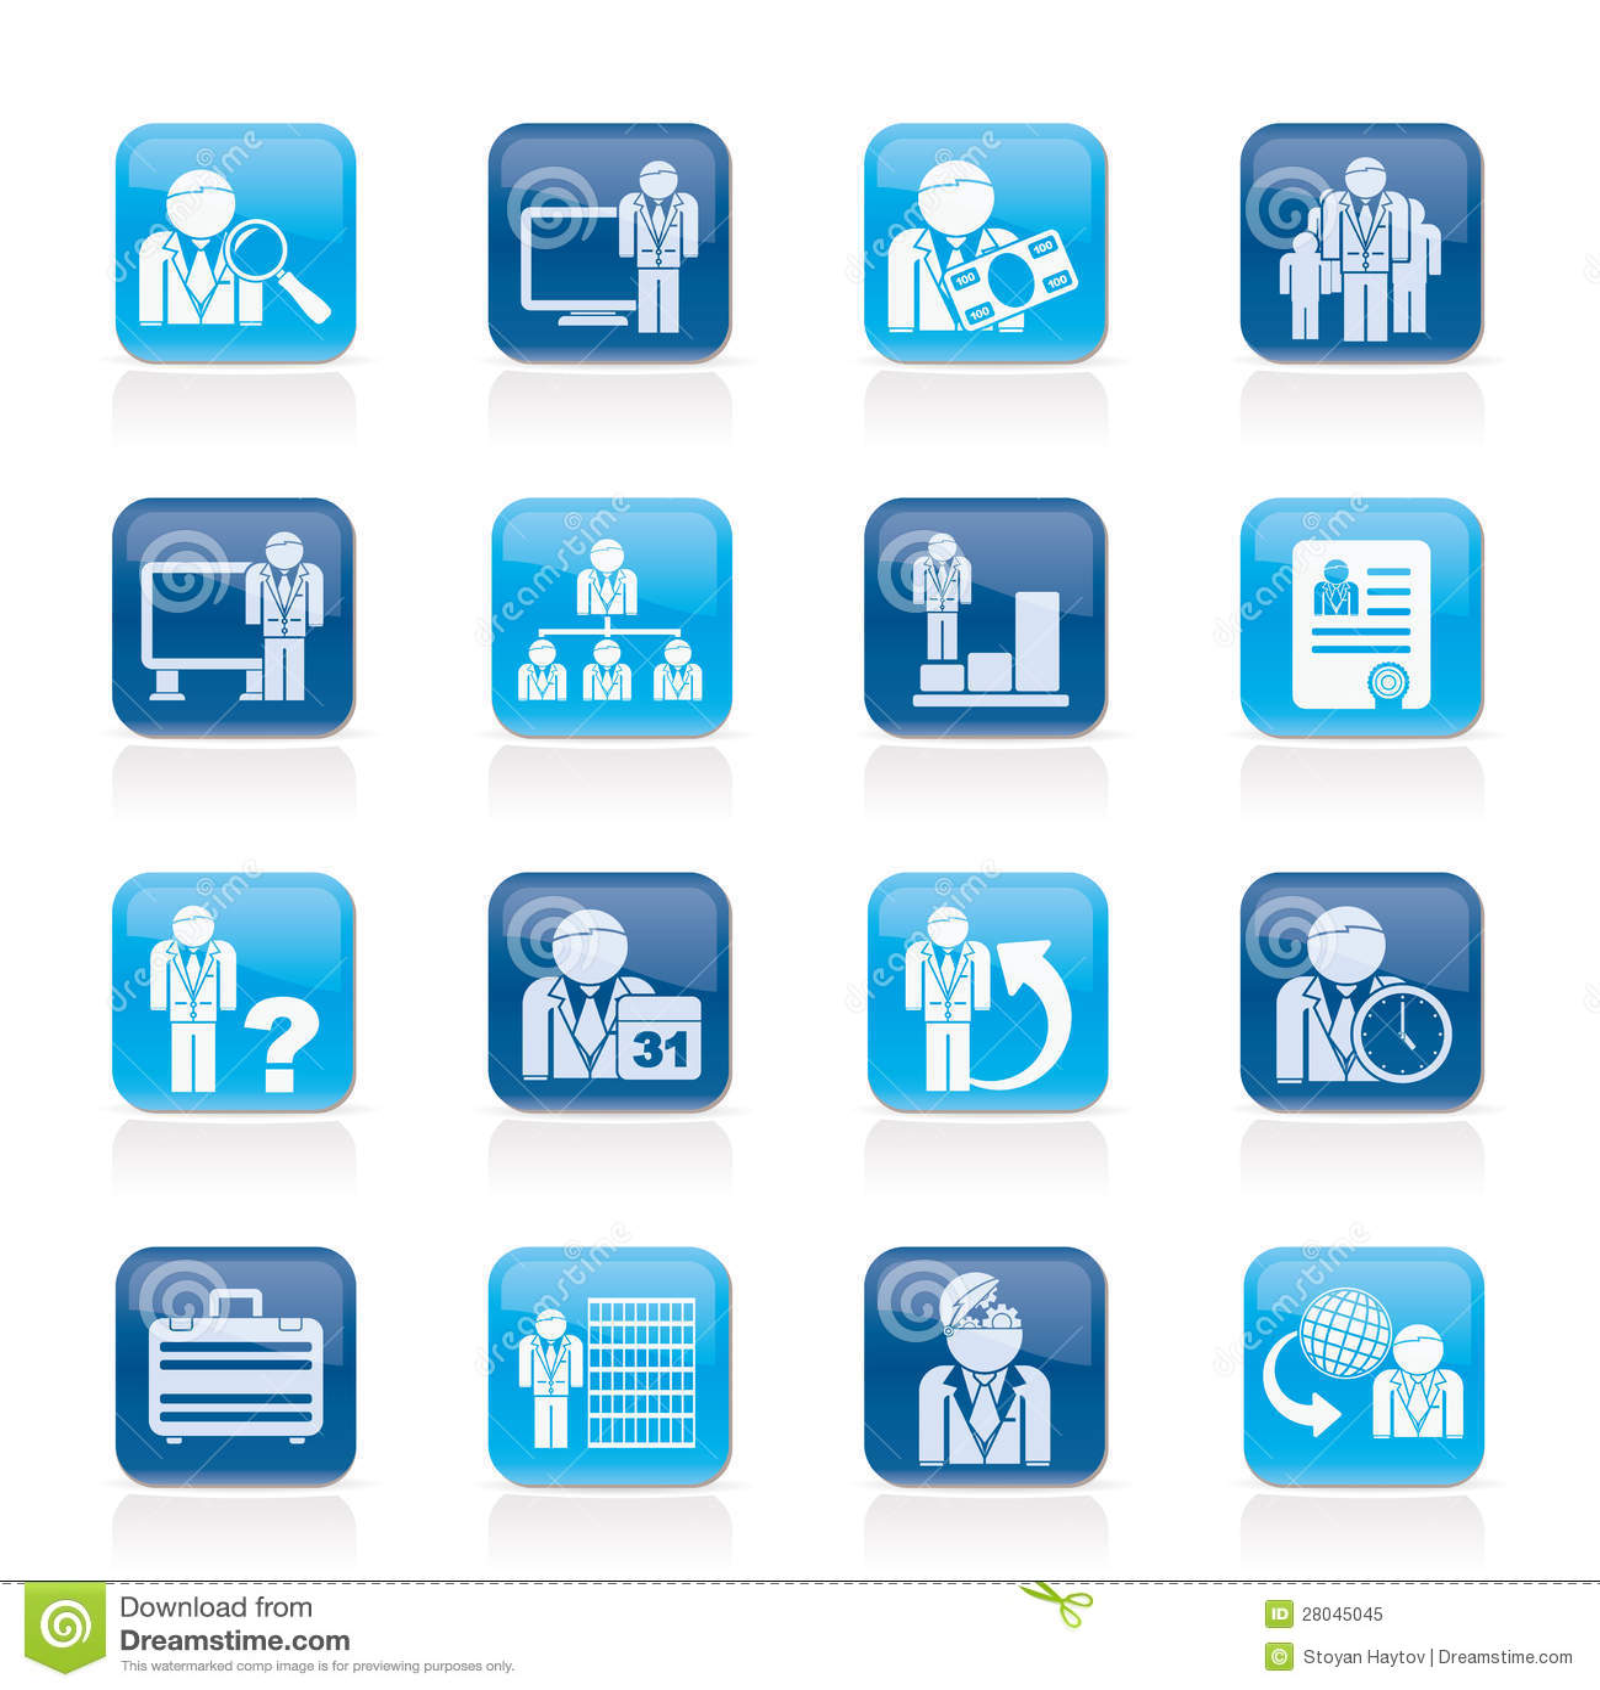 企业、管理和层次结构图标